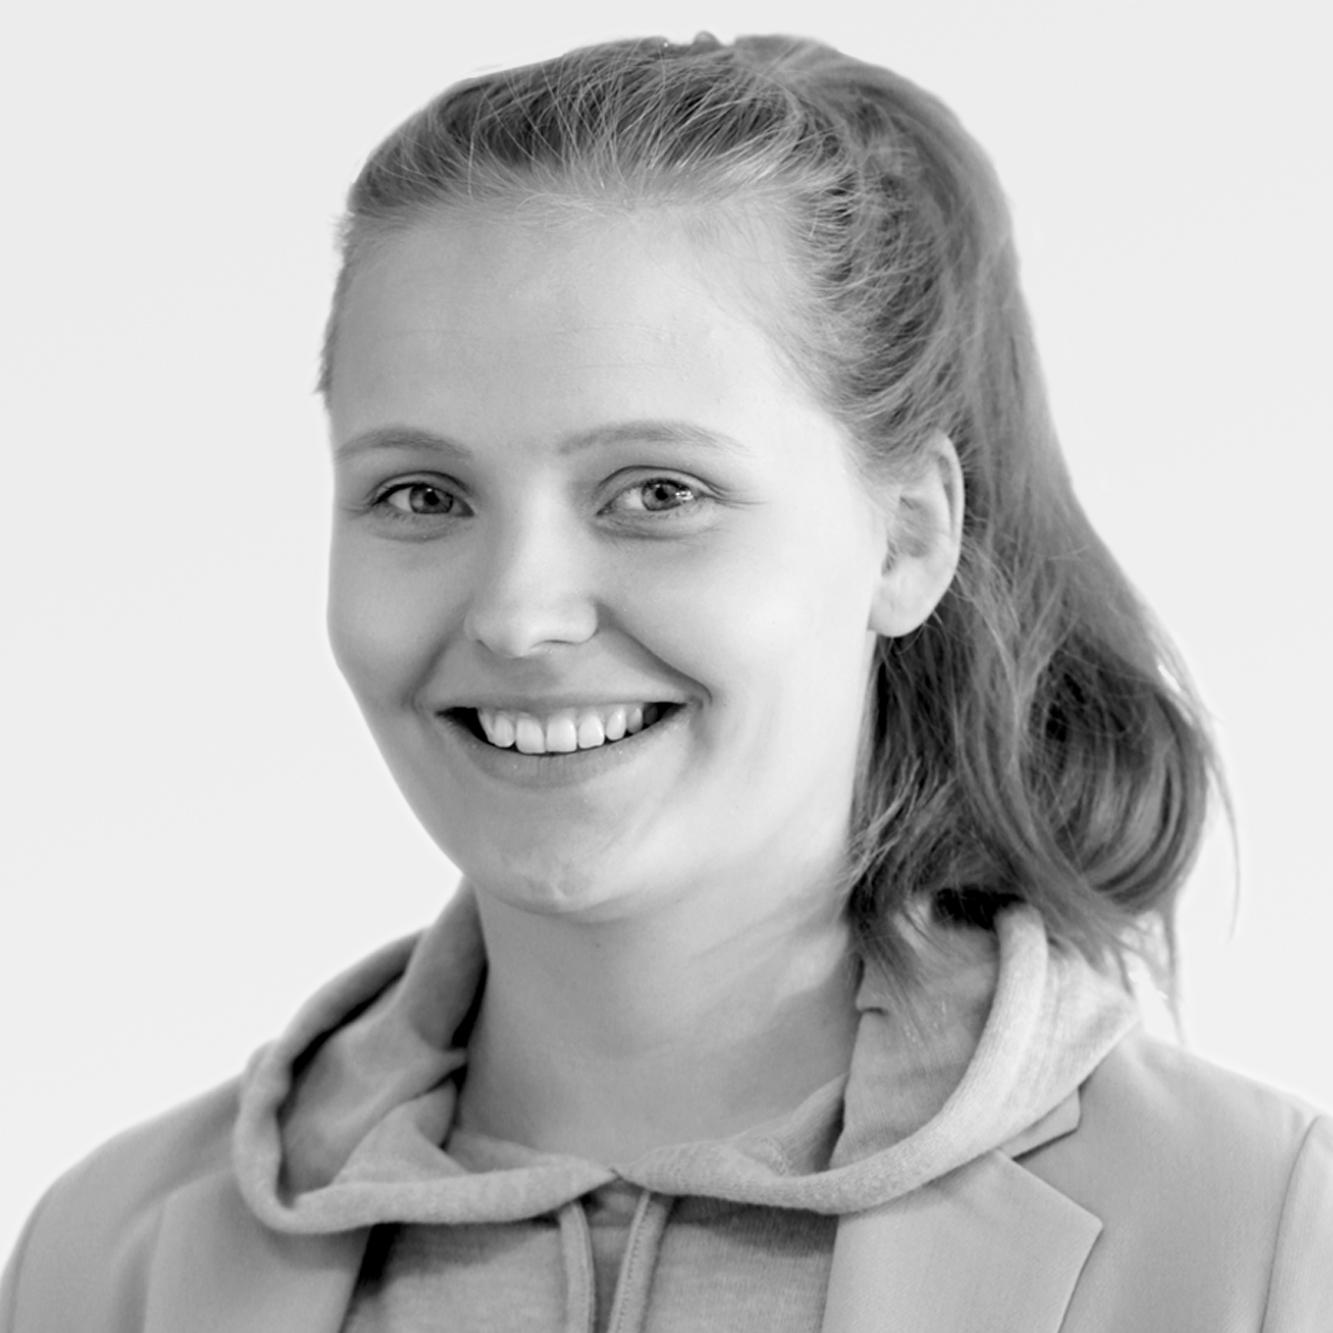 Laura Elkmann